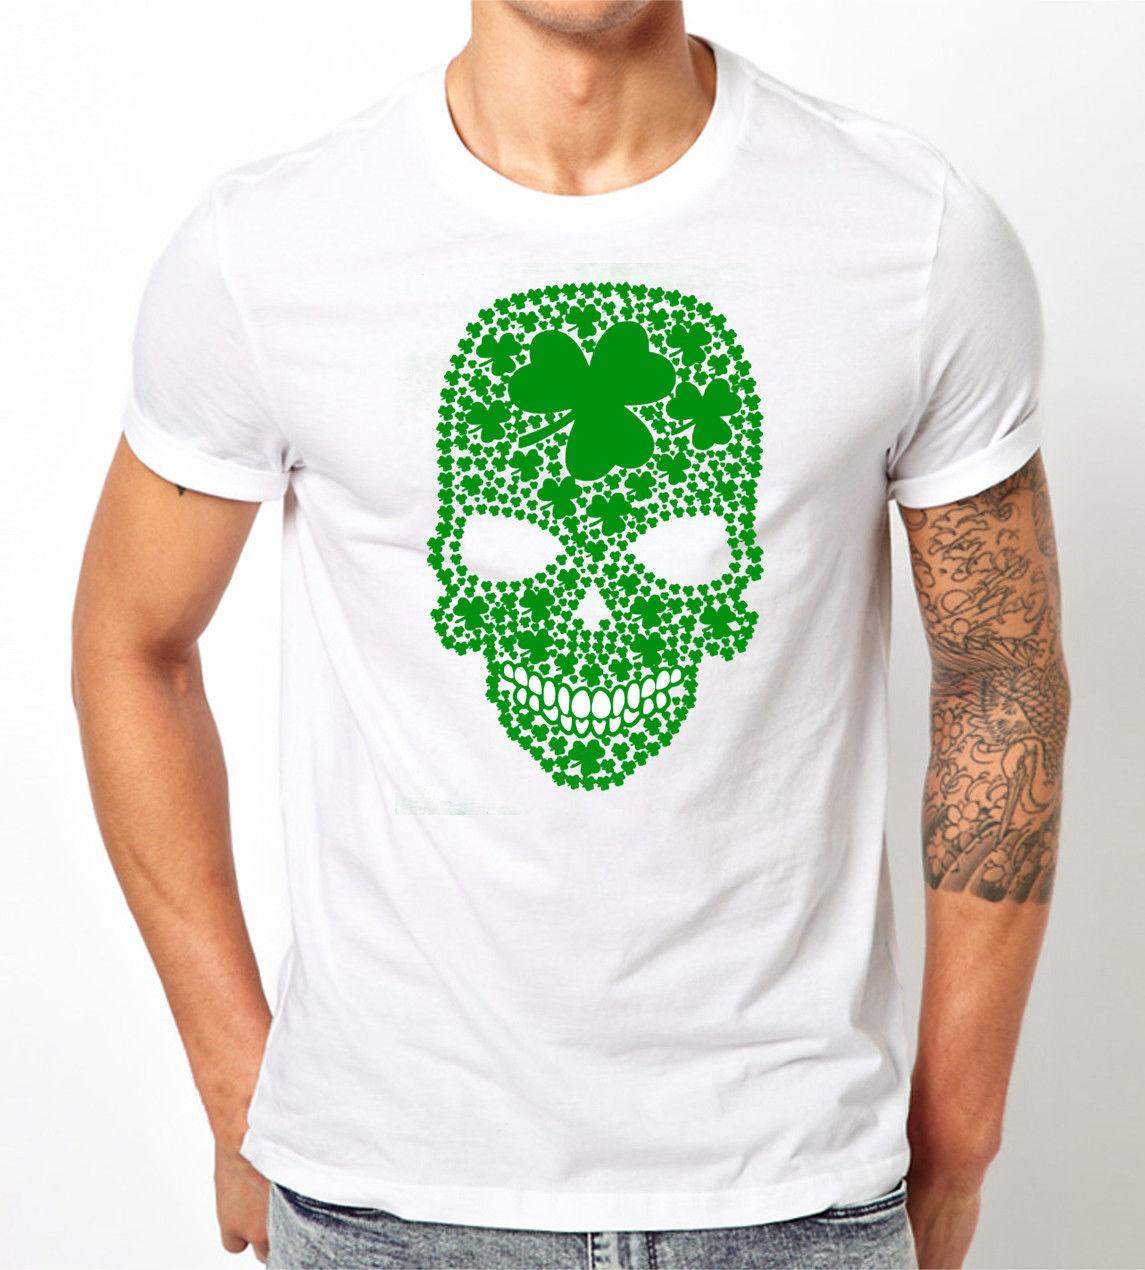 86e242761bb Shamrock Skull Unisex T Shirt. Funny St Patrick S Day Shirt Parade Irish  Green Cotton Men T Shirts Classical Top Tee Basic Models Printed Shirts  Design ...